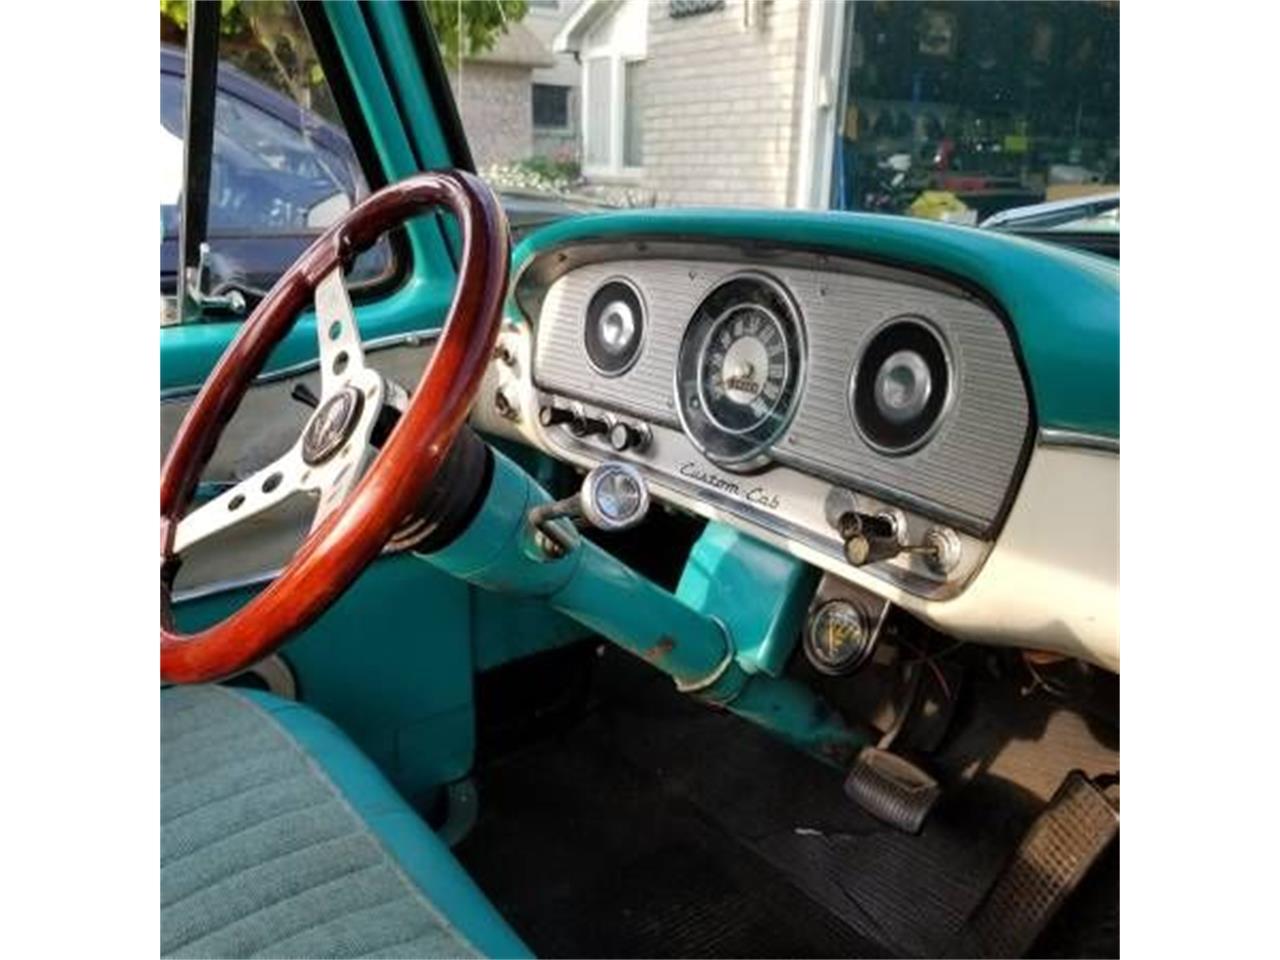 Large Picture of '64 Ford F100 located in Cadillac Michigan - $9,995.00 - QSPO